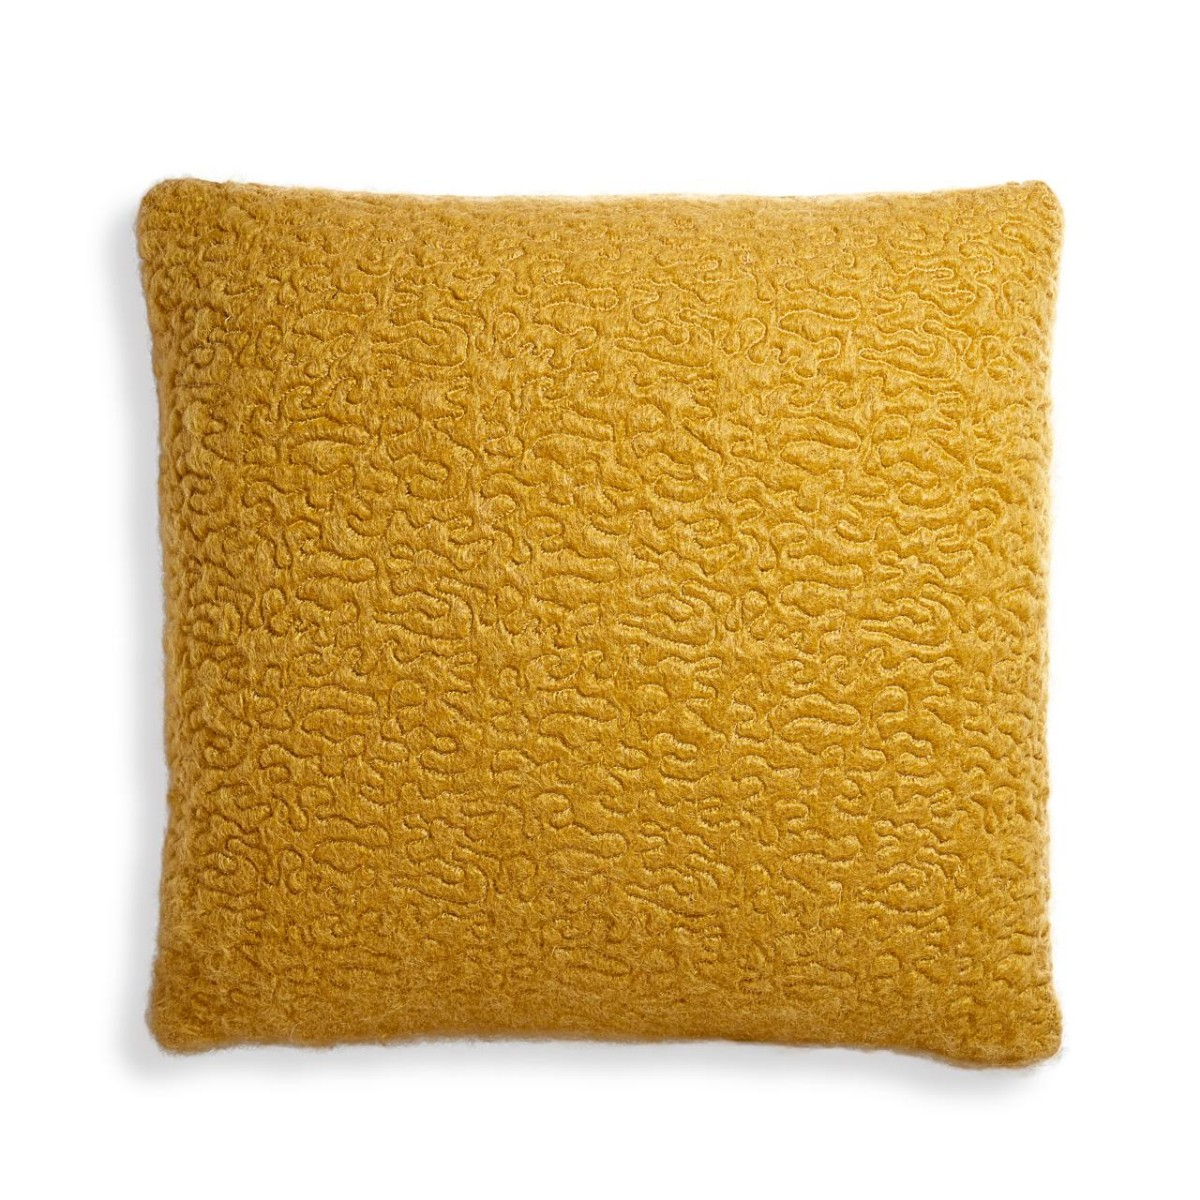 L'Objet I Haas Vermiculation Pillow I Saffron